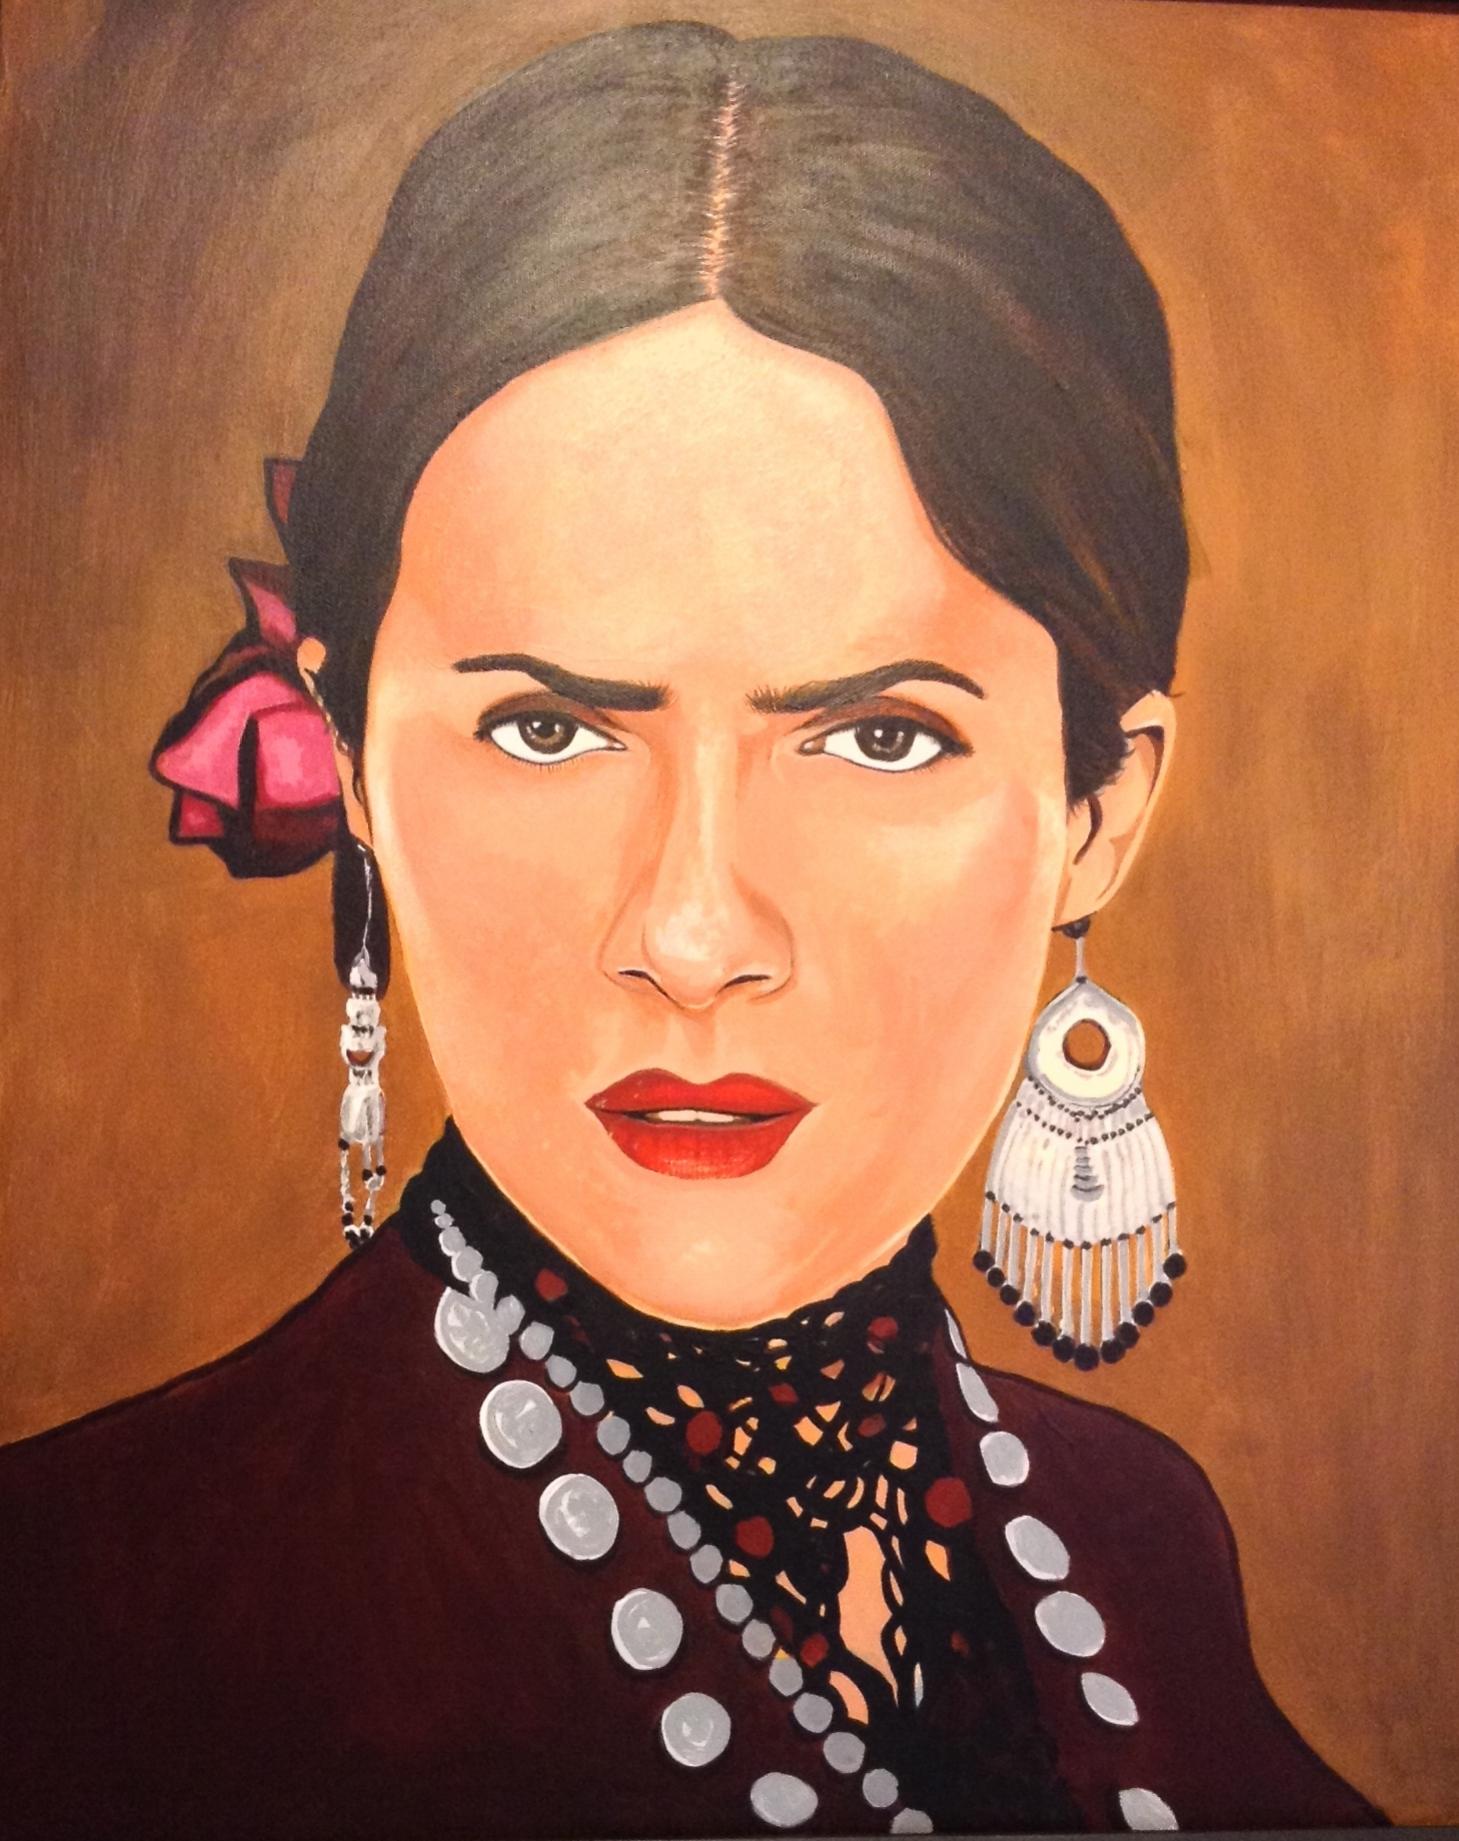 "Zamora, Gil.  Salma as Freda.  2010. Acrylic on canvas, 18"" x 24"". Private collection."